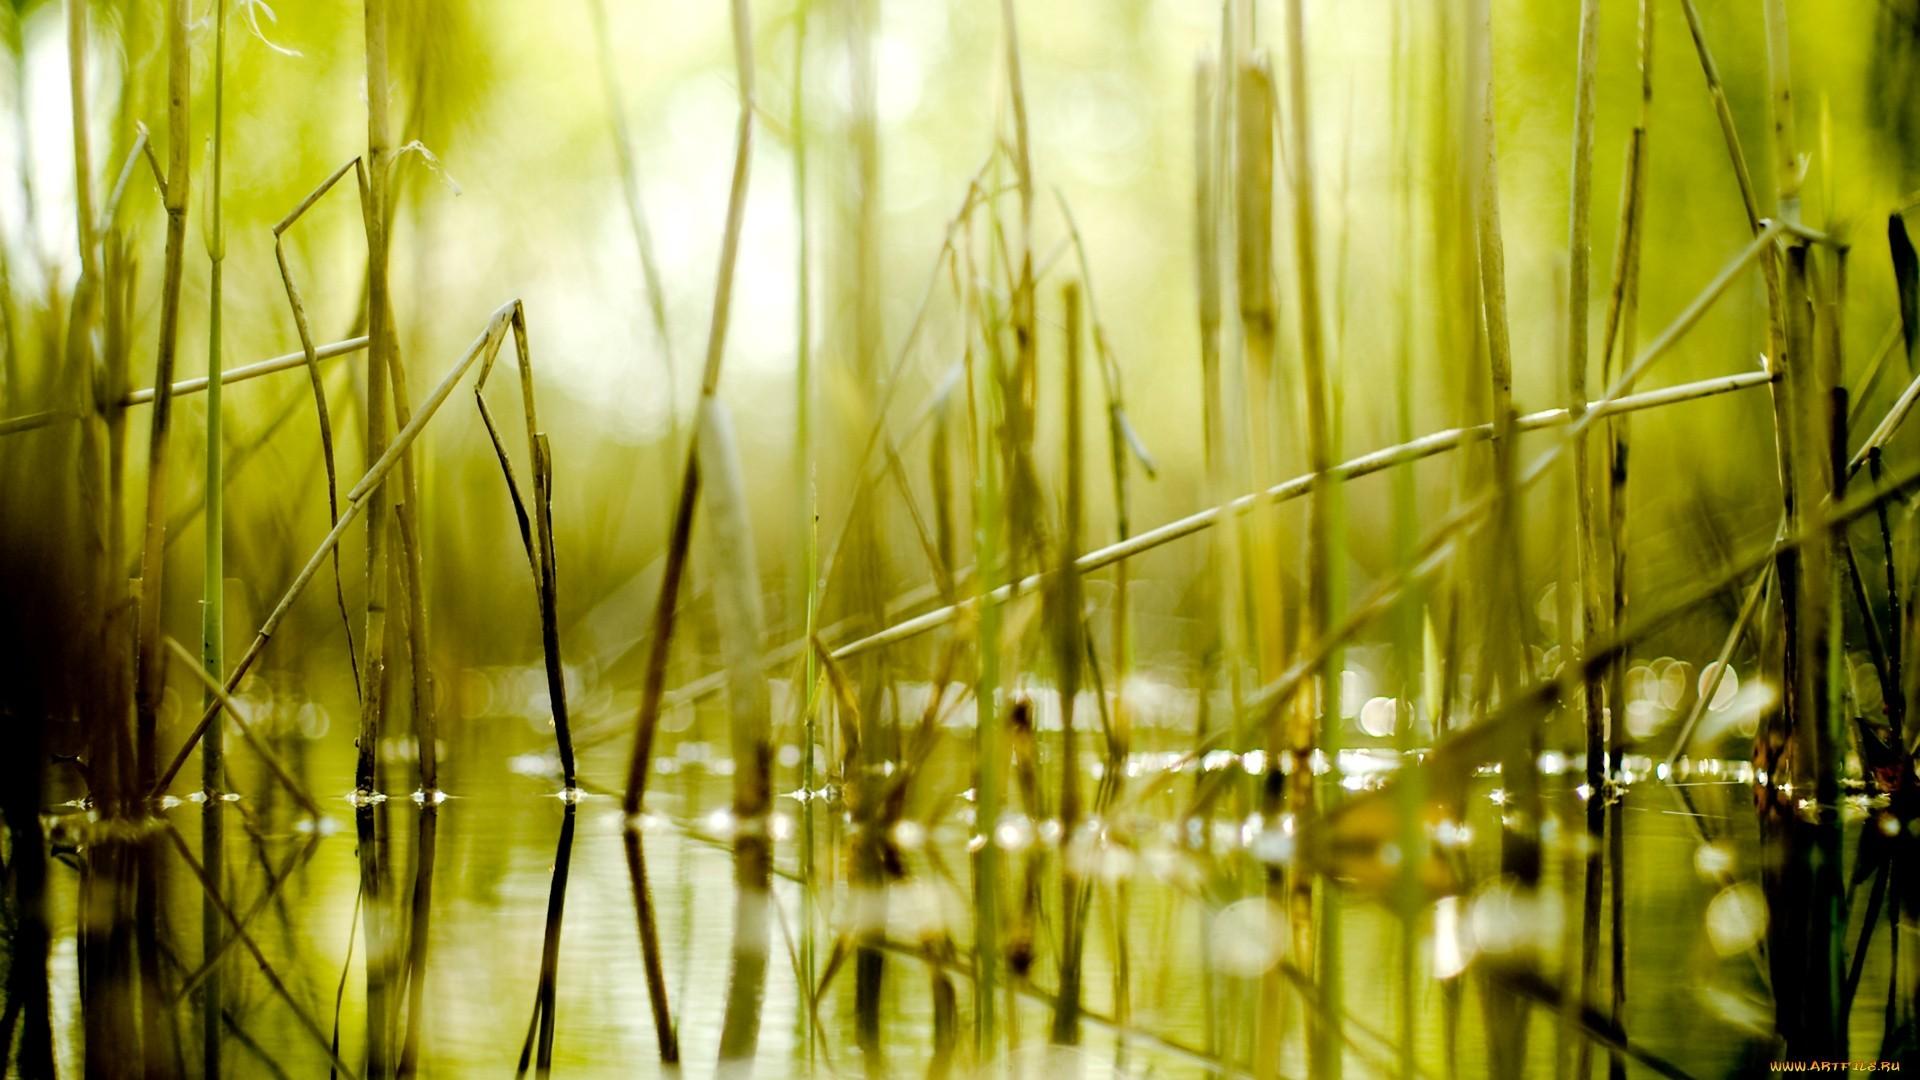 Seagrass HD Wallpaper